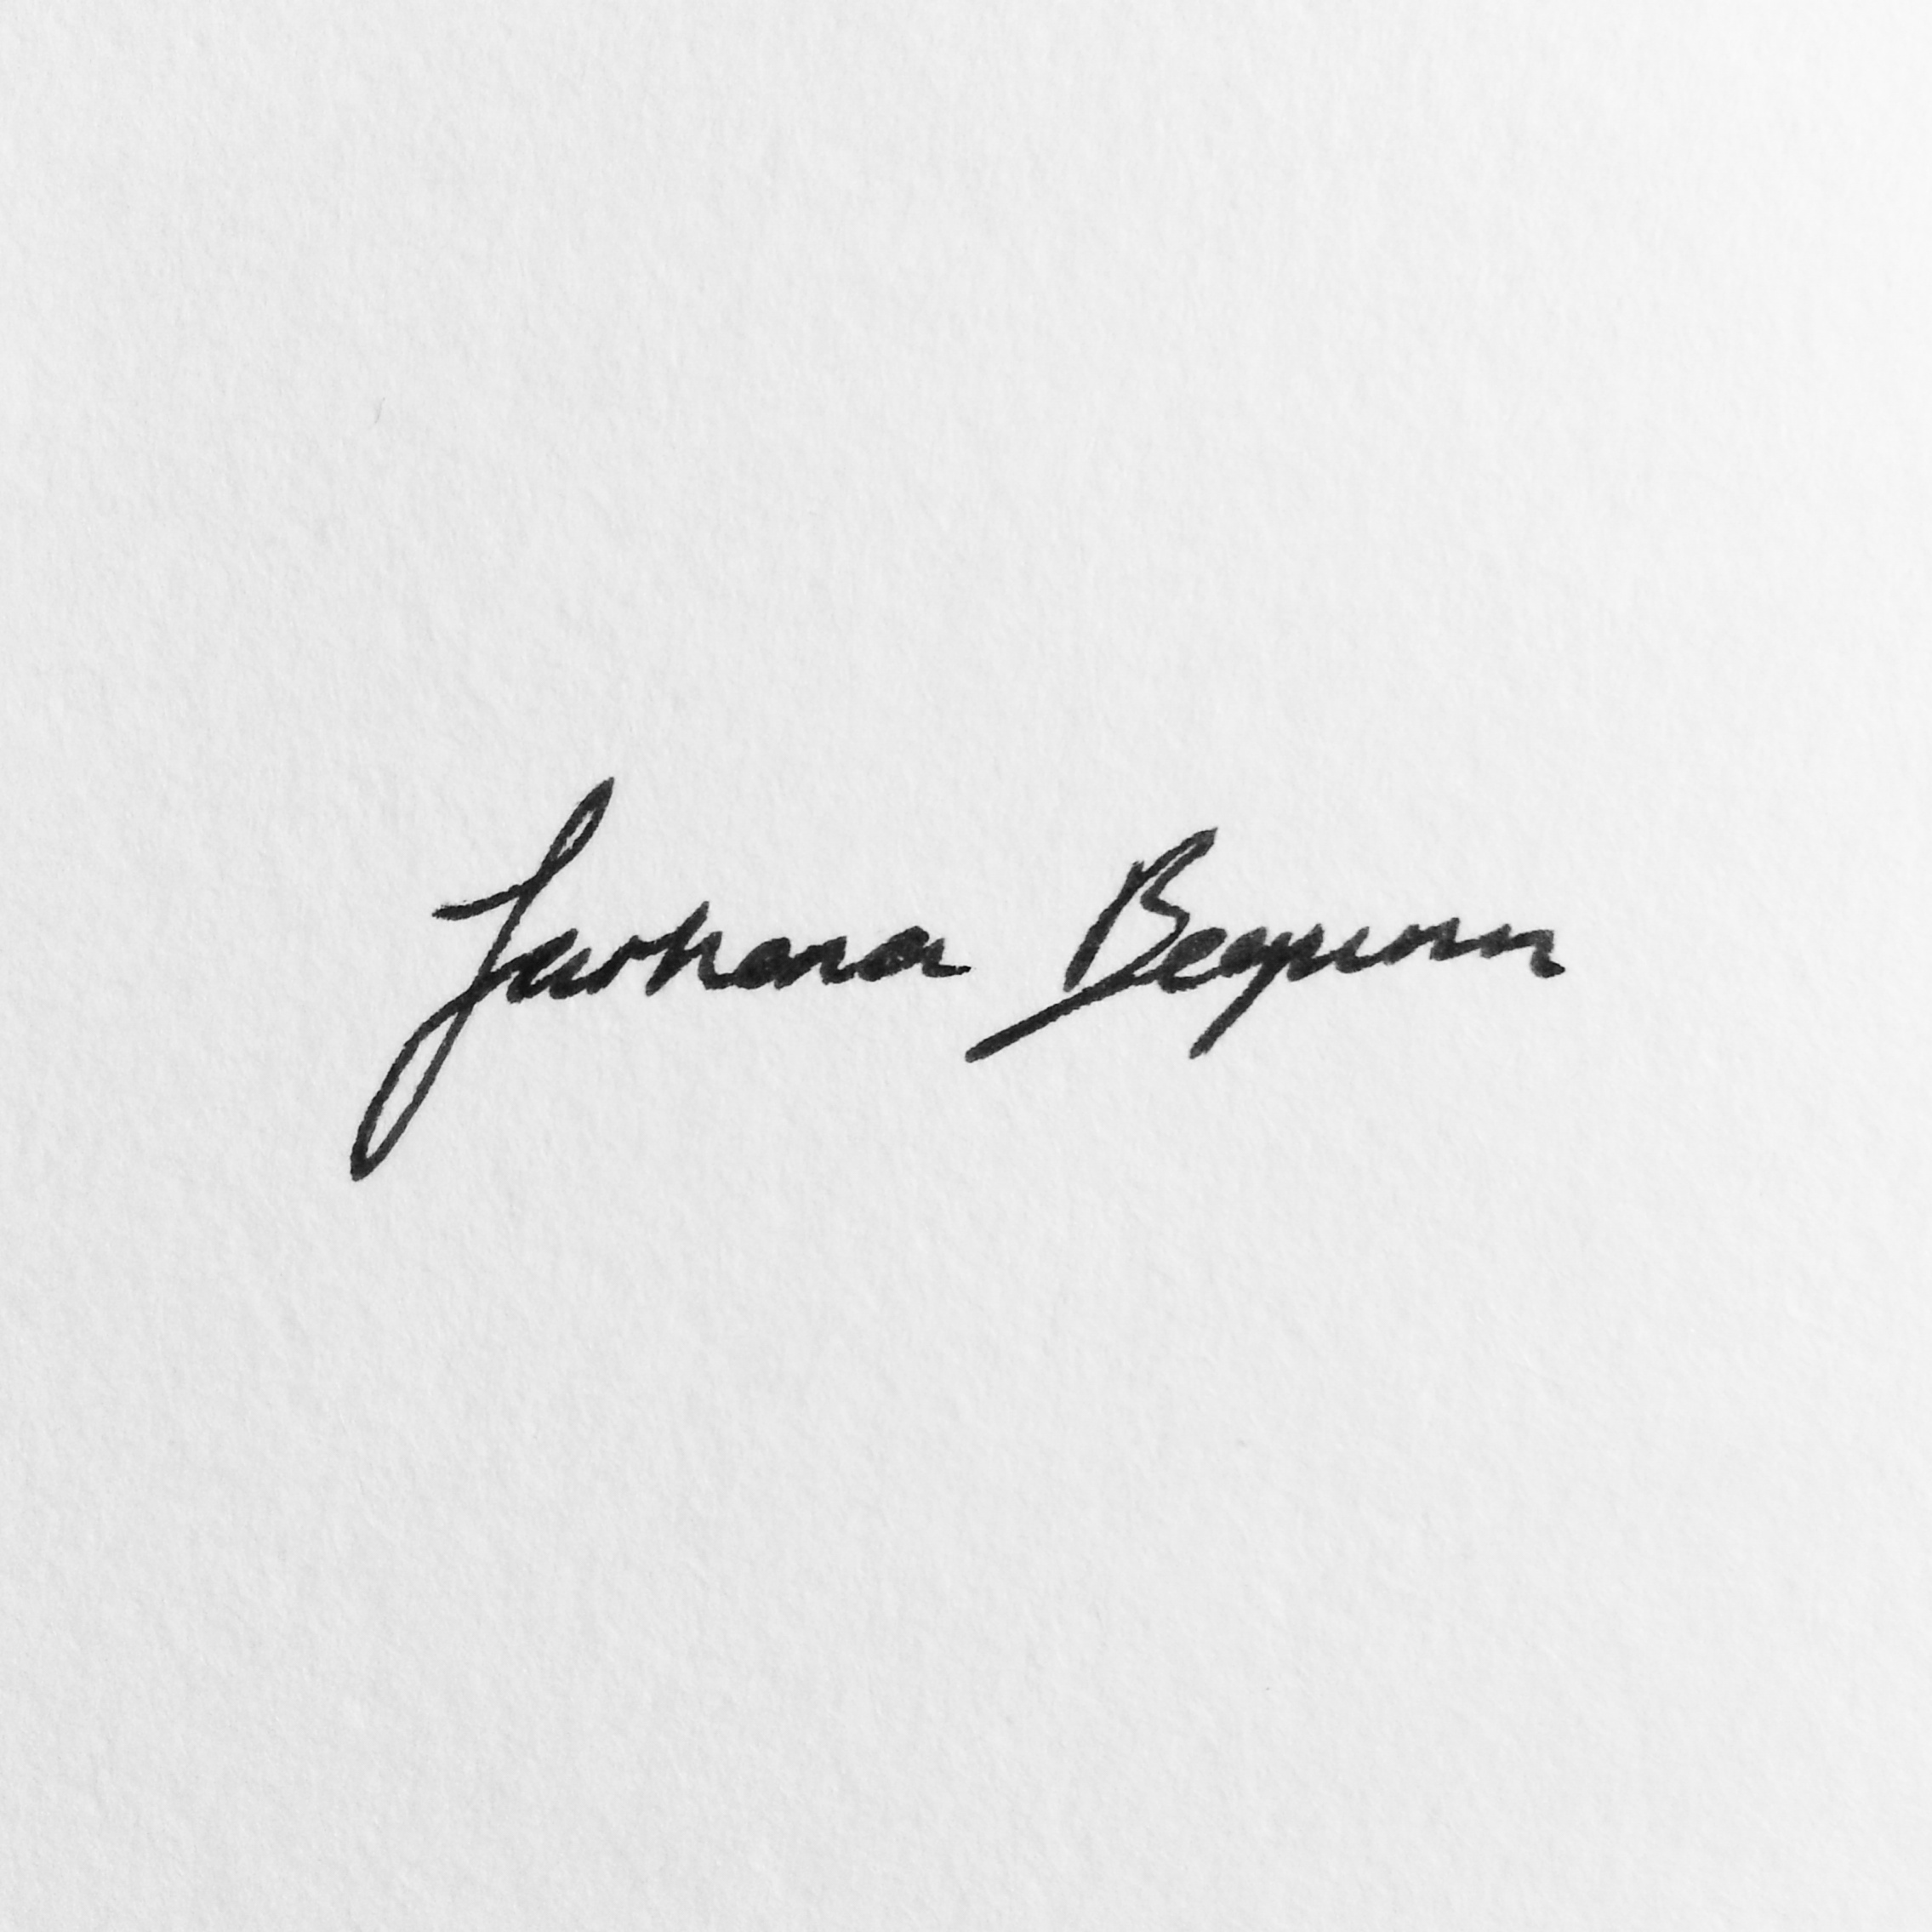 Farhana Begum's Signature